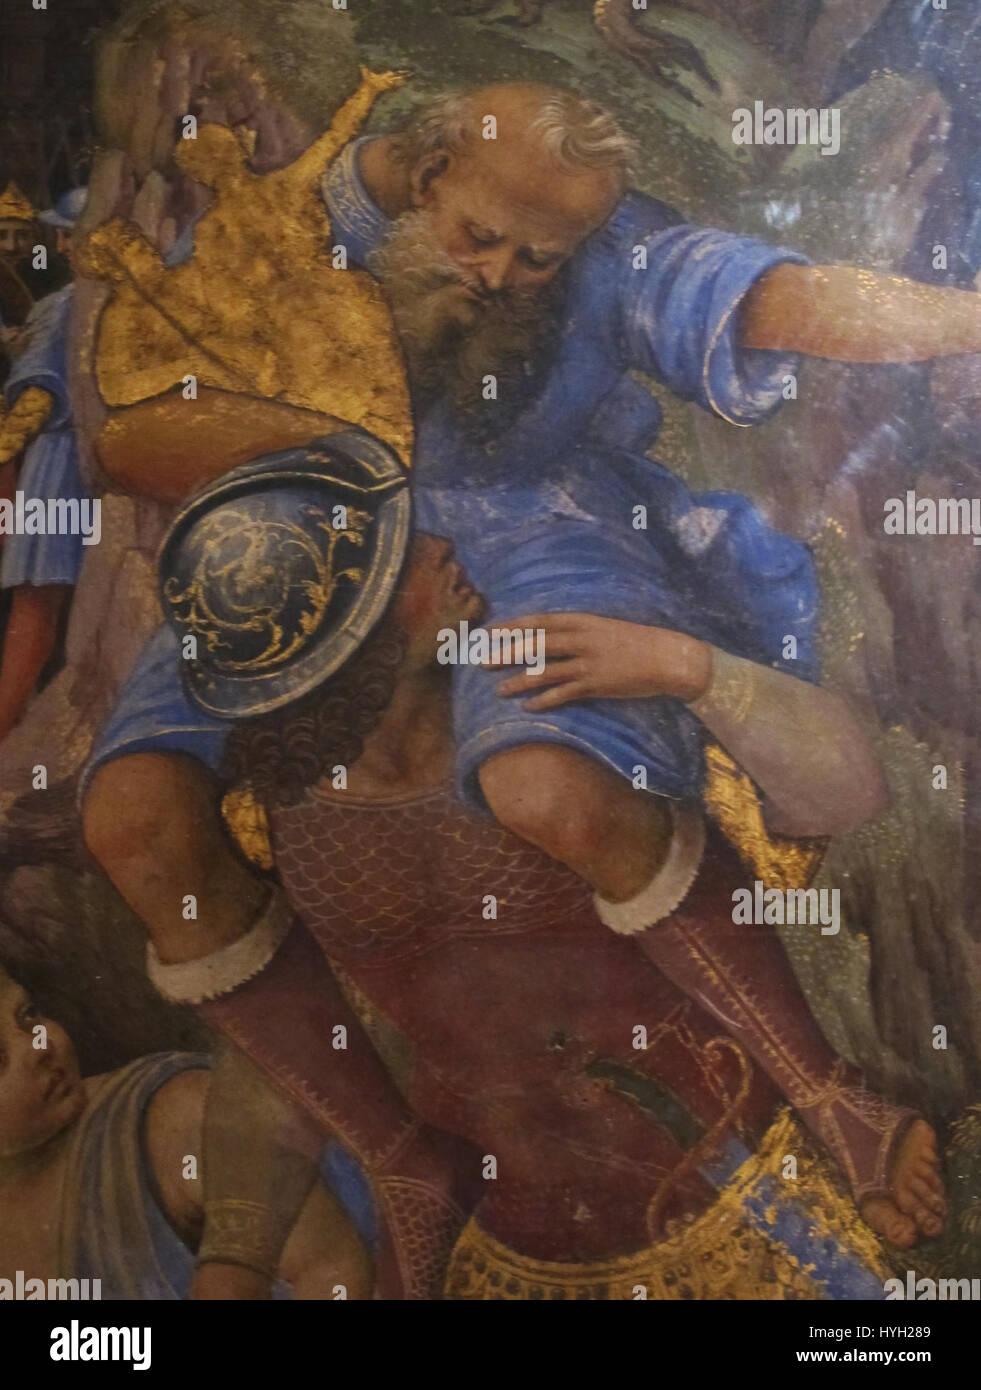 Girolamo genga, fuga da troiai, 1508 09, dal palazzo del magnifico petrucci 04 - Stock Image